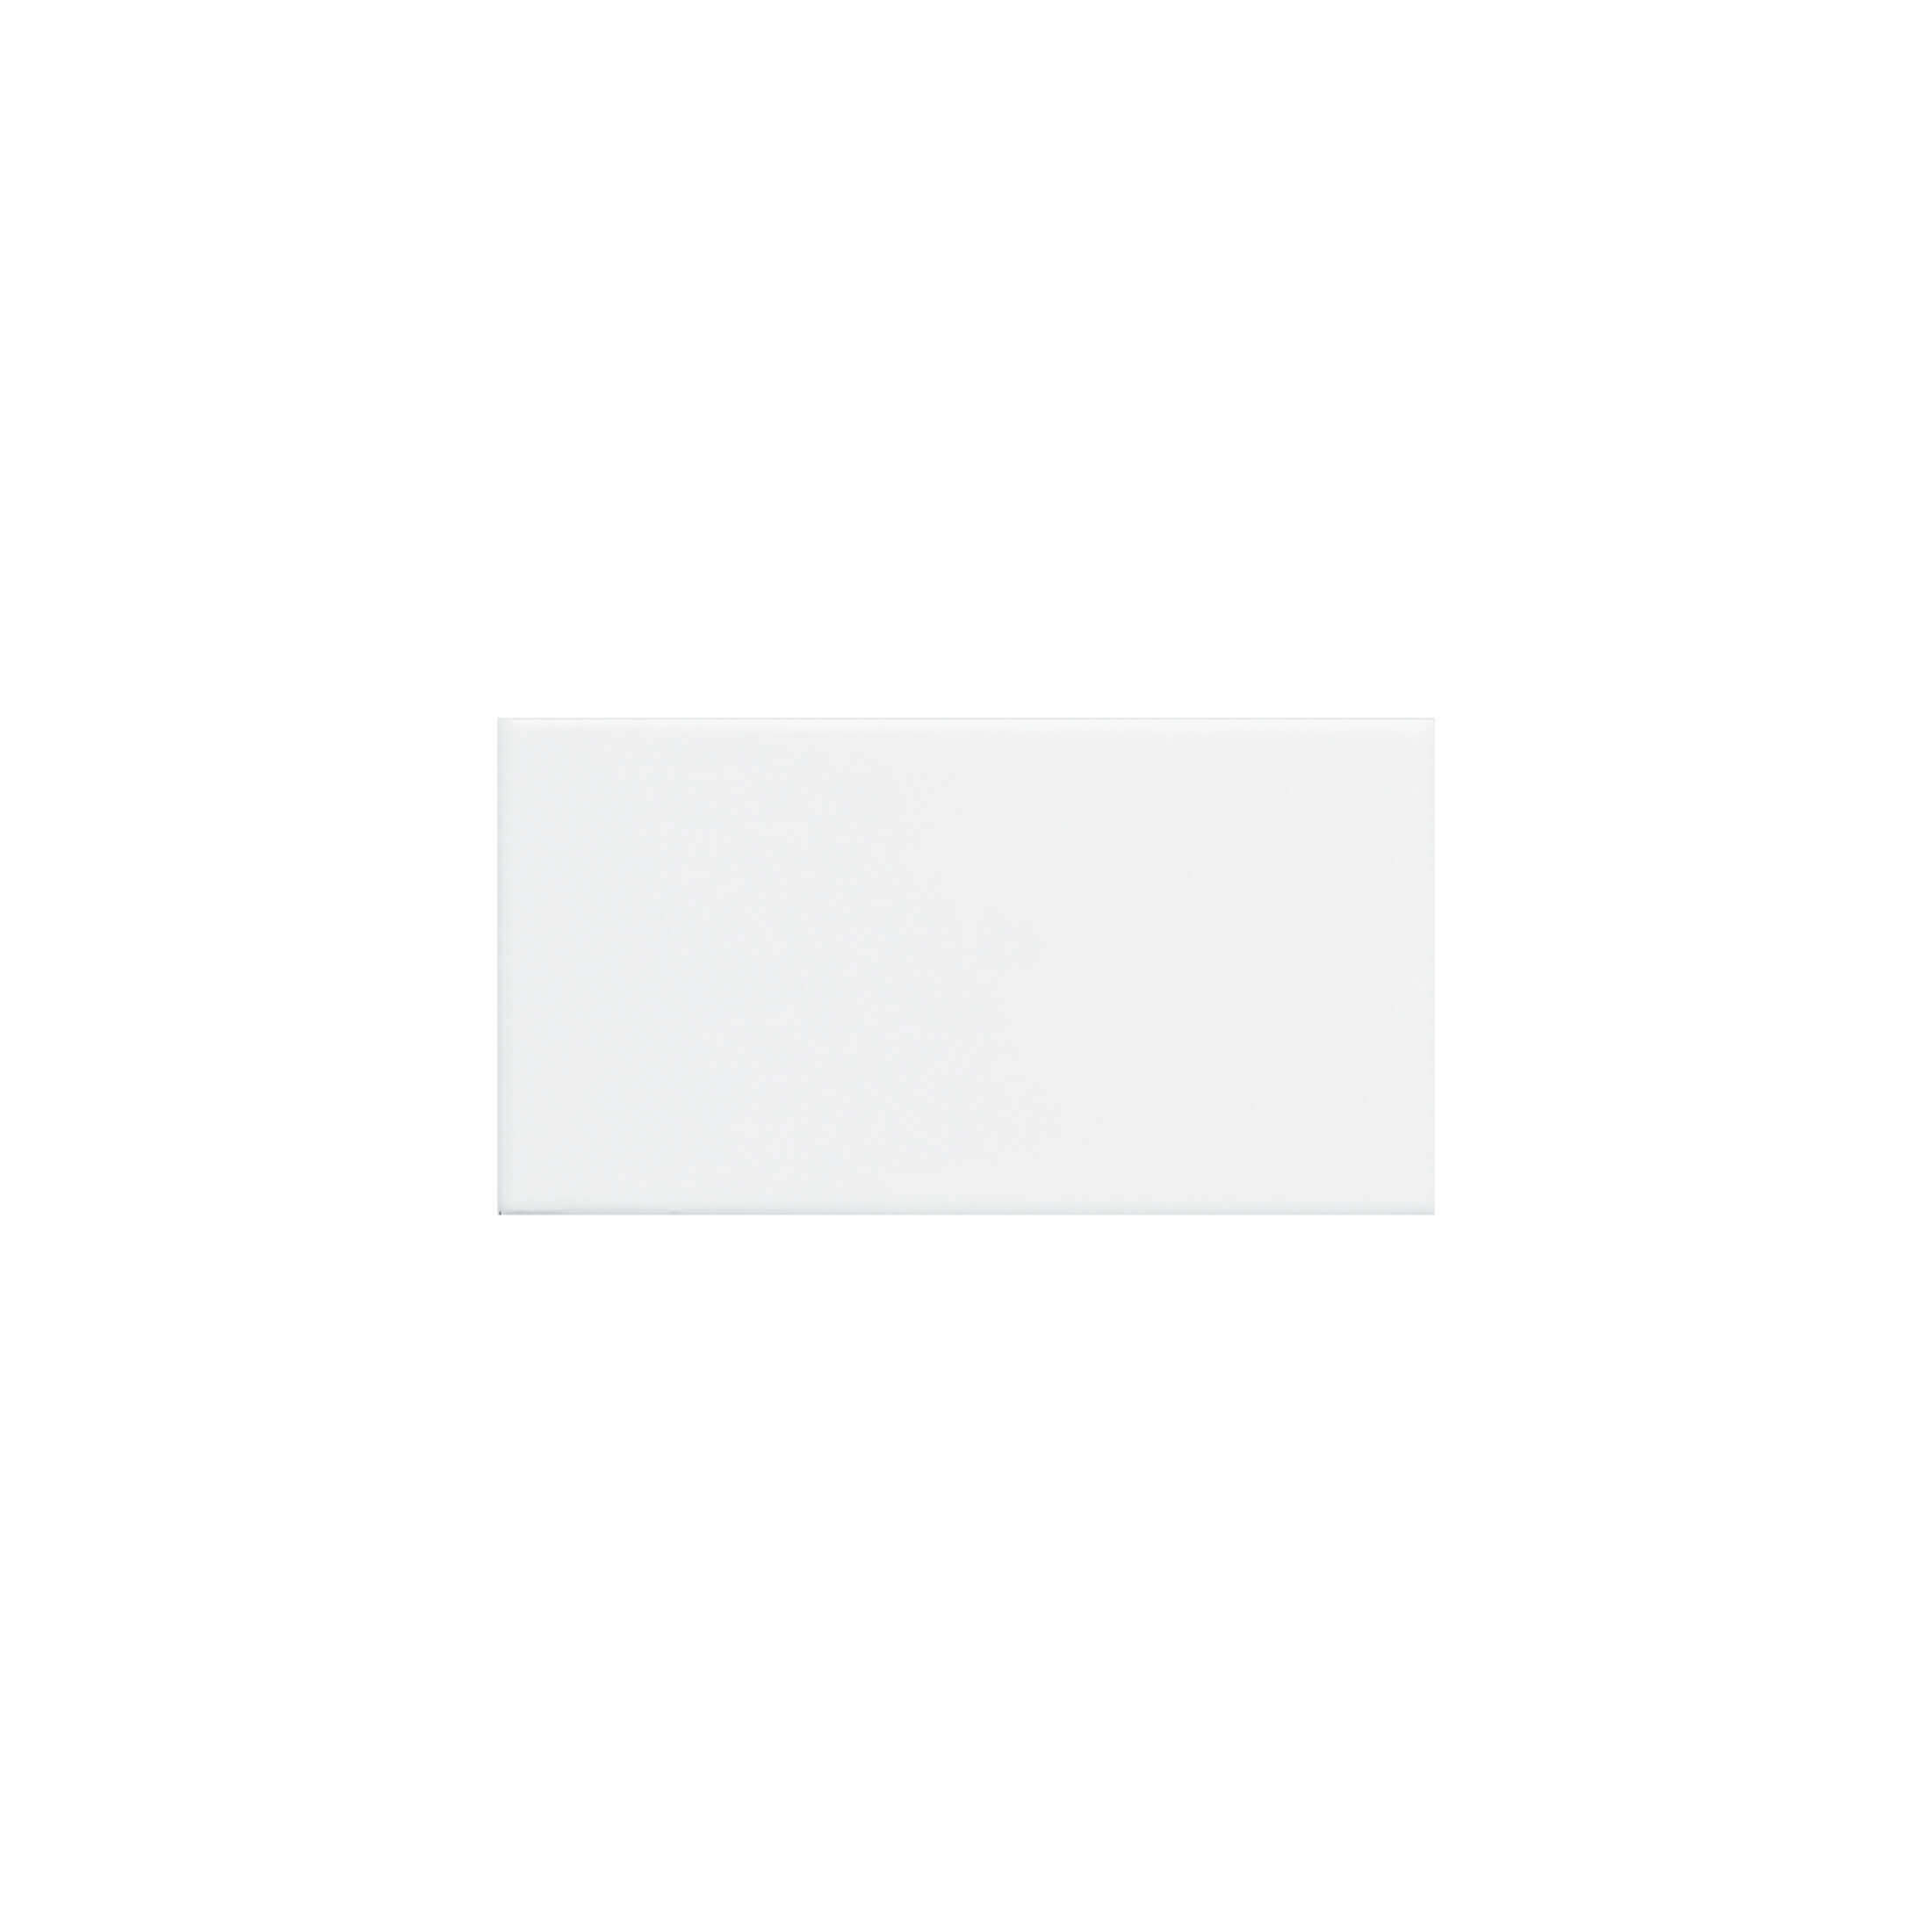 ADNE1034 - LISO PB - 7.5 cm X 15 cm